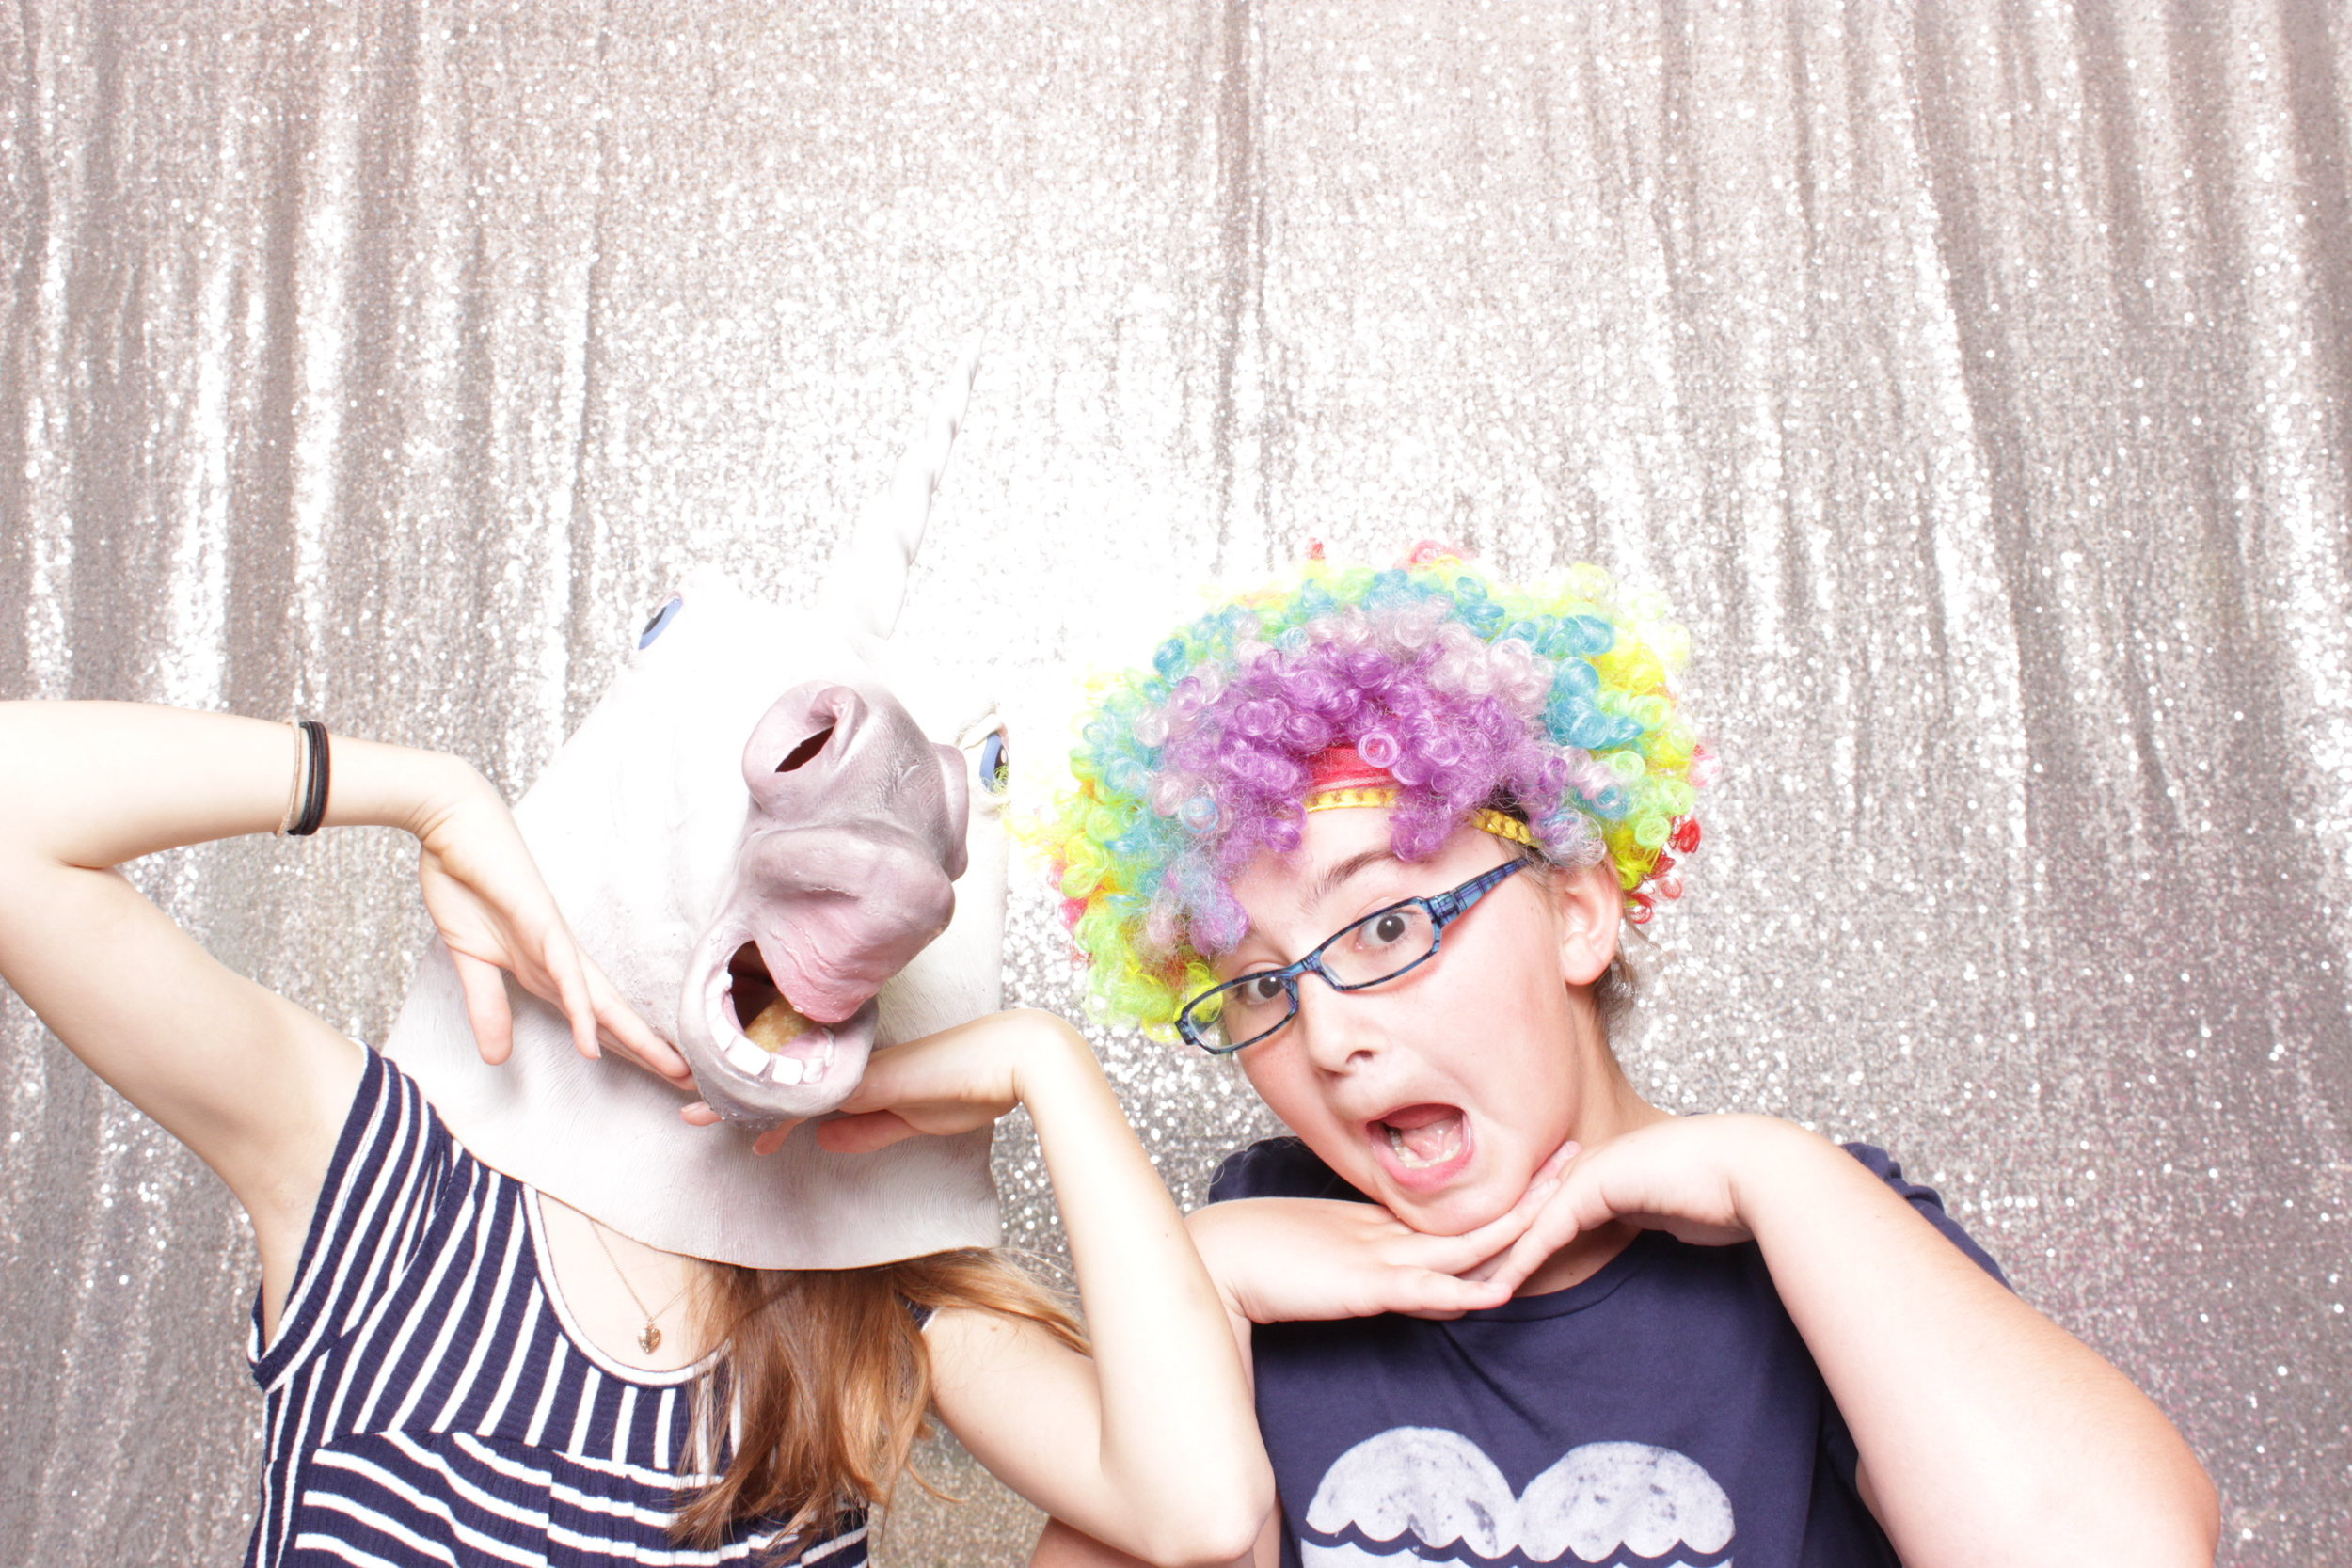 chico-photo-booth-rental-birthday-unicorn-prop.jpg